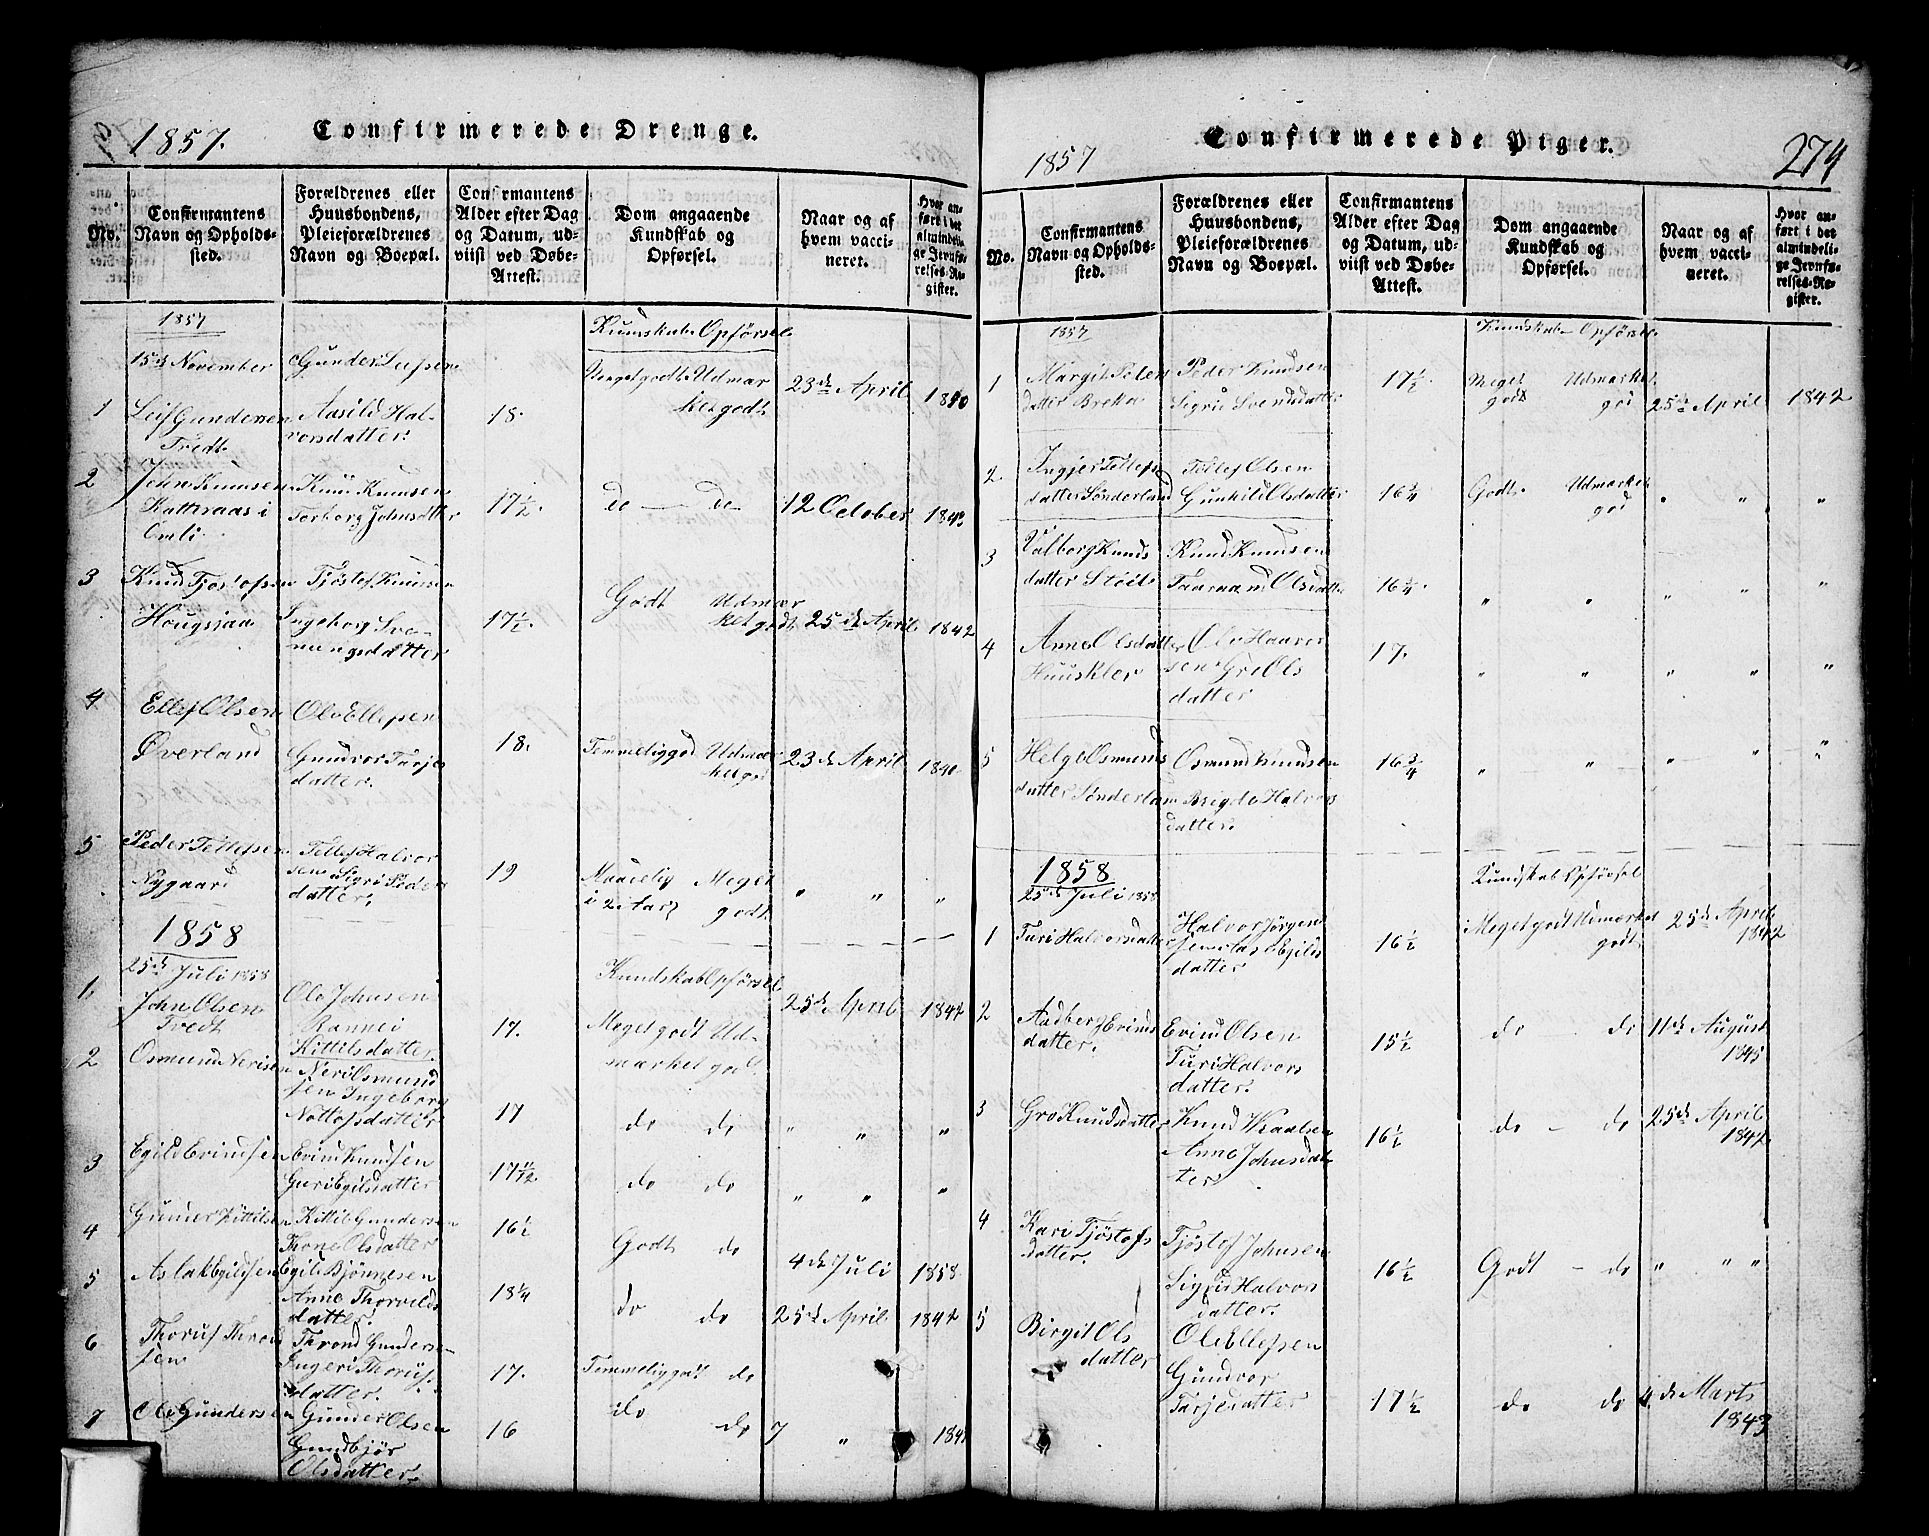 SAKO, Nissedal kirkebøker, G/Gb/L0001: Klokkerbok nr. II 1, 1814-1862, s. 274